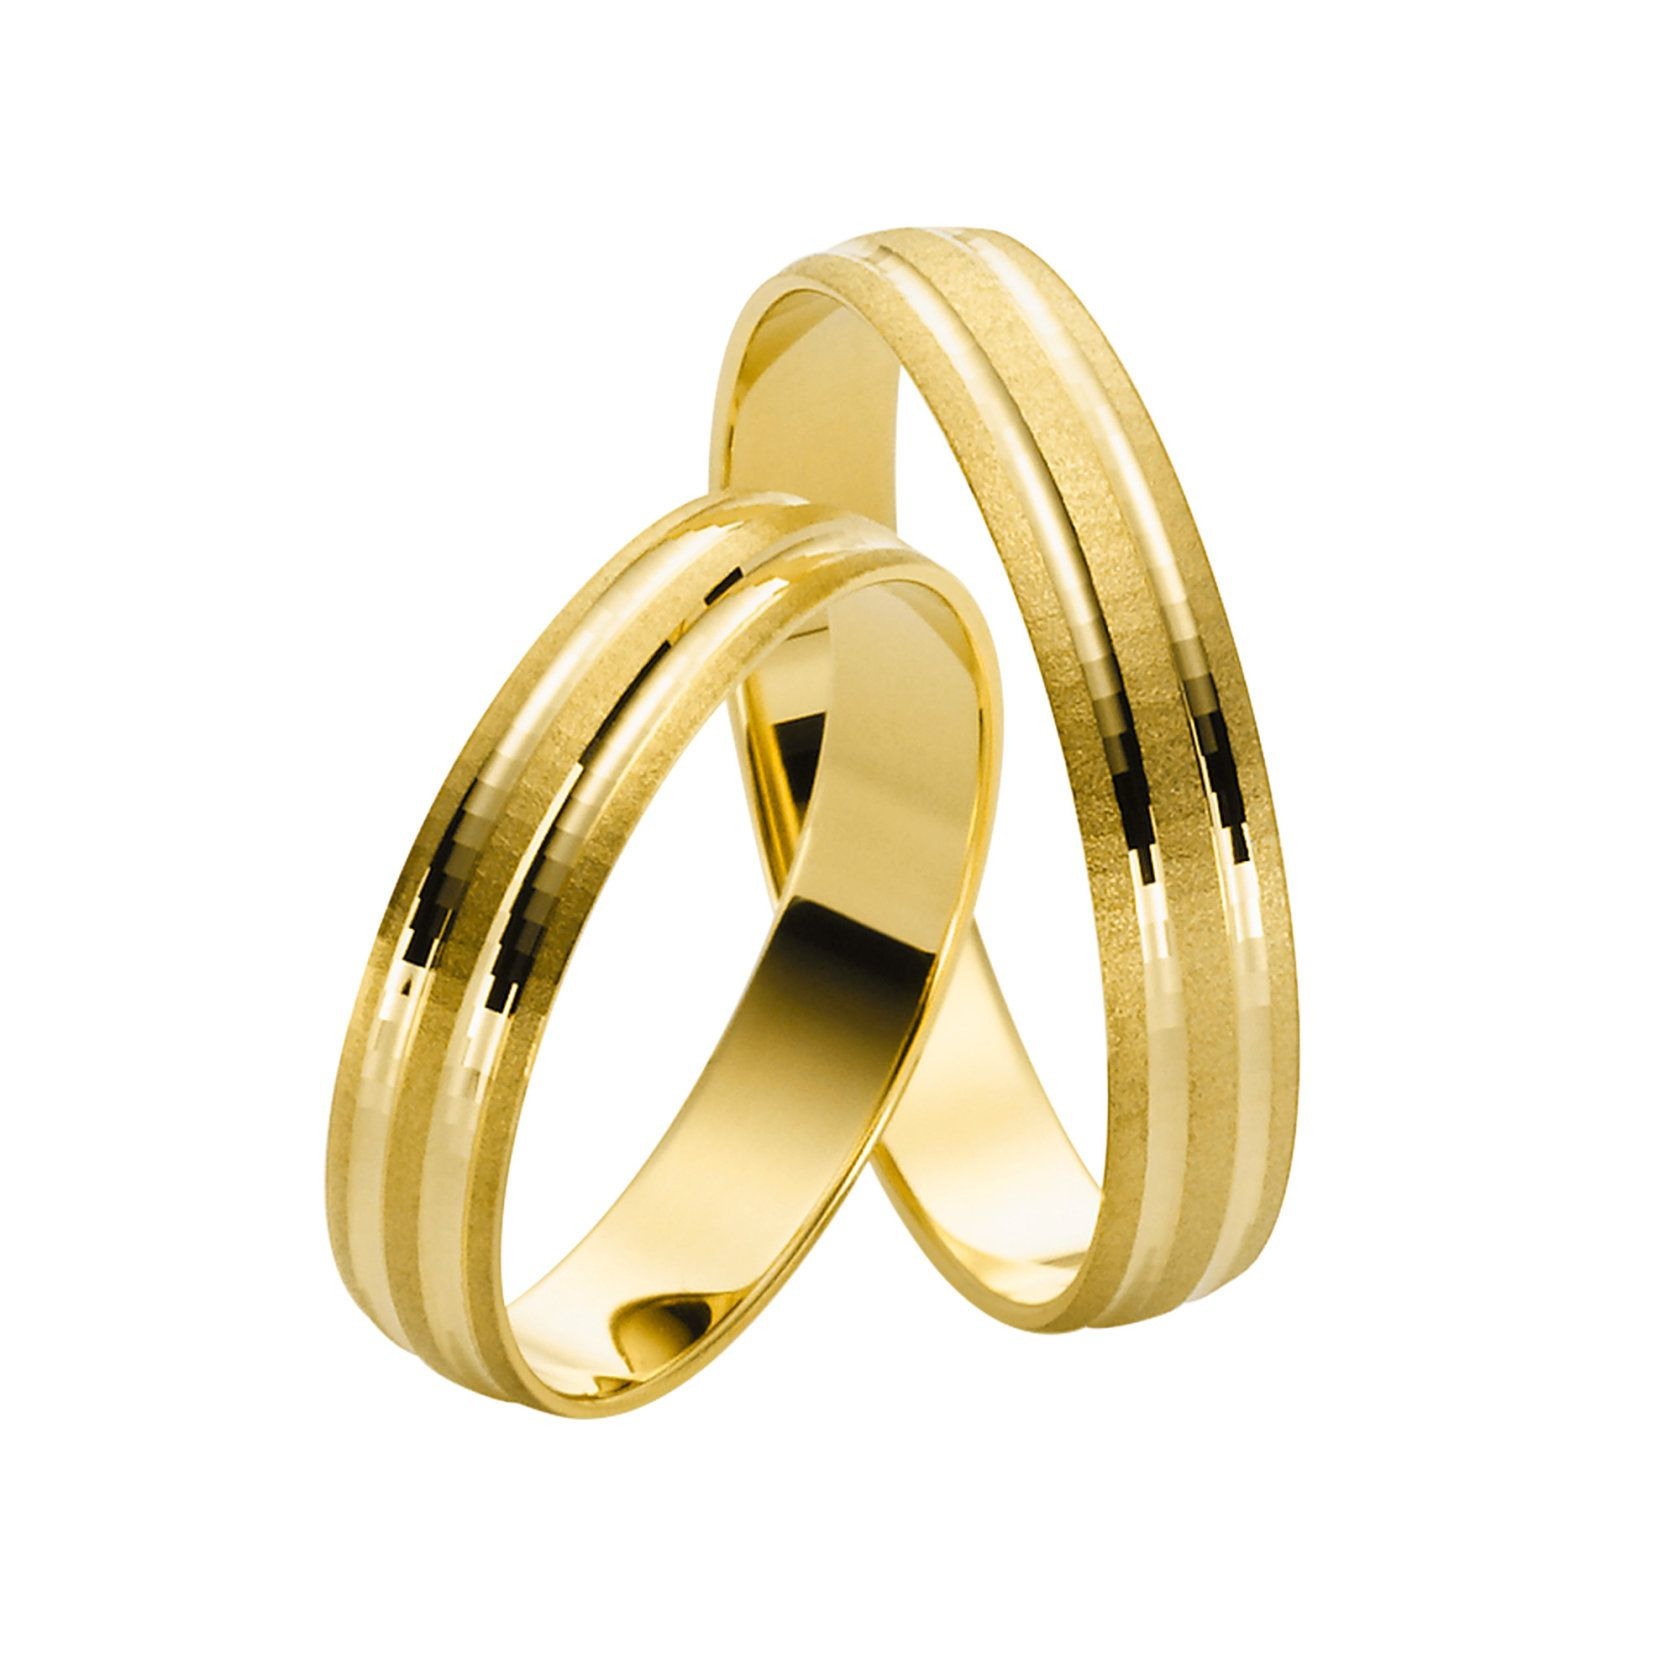 Juwelier Kraemer Trauringe Elba | Trauringe Gold, Trauringe